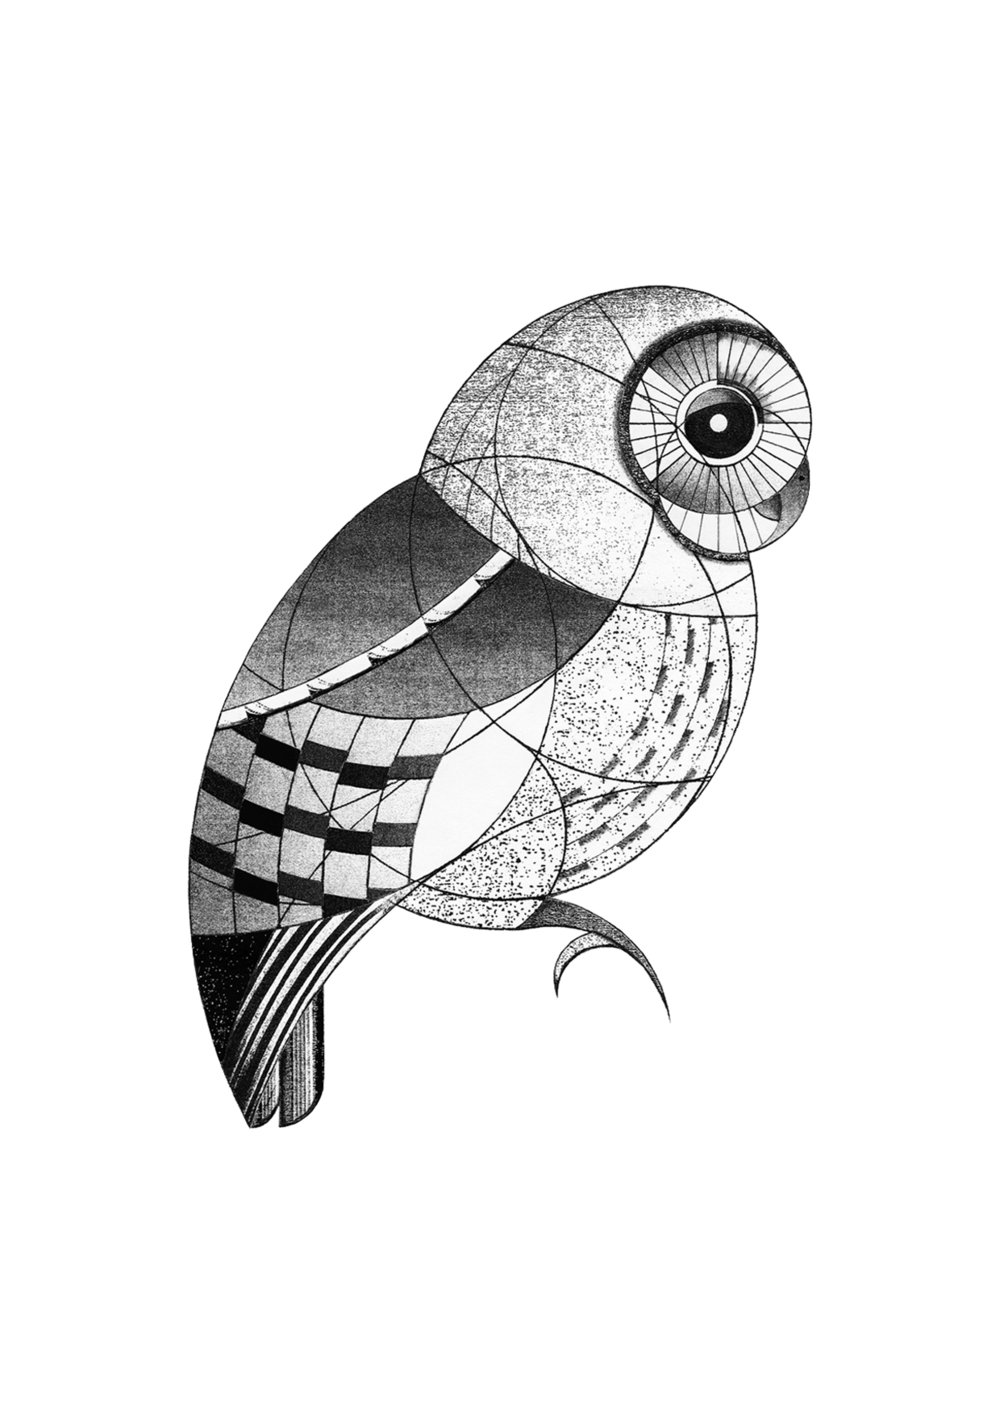 tawny owl (2015)